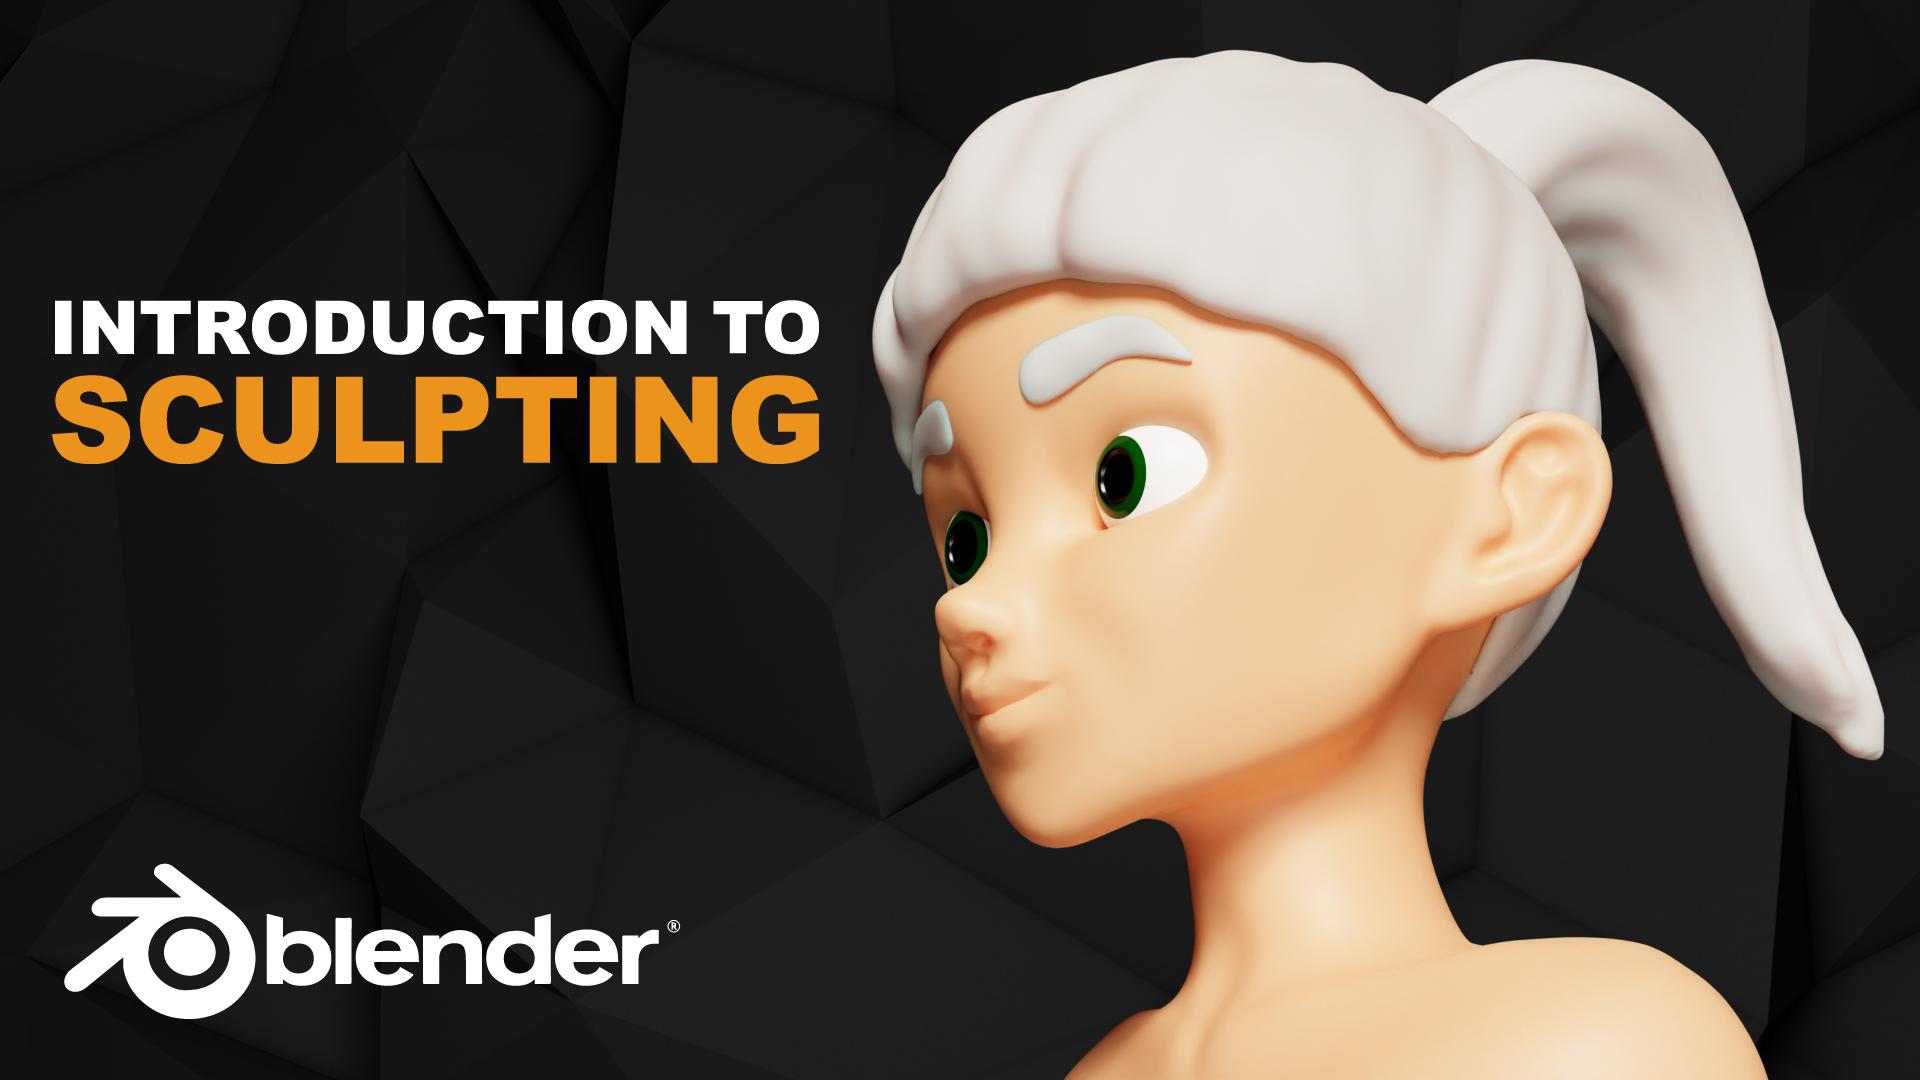 Sculpting Woman Head Introduction Blender Course Academy Beginner